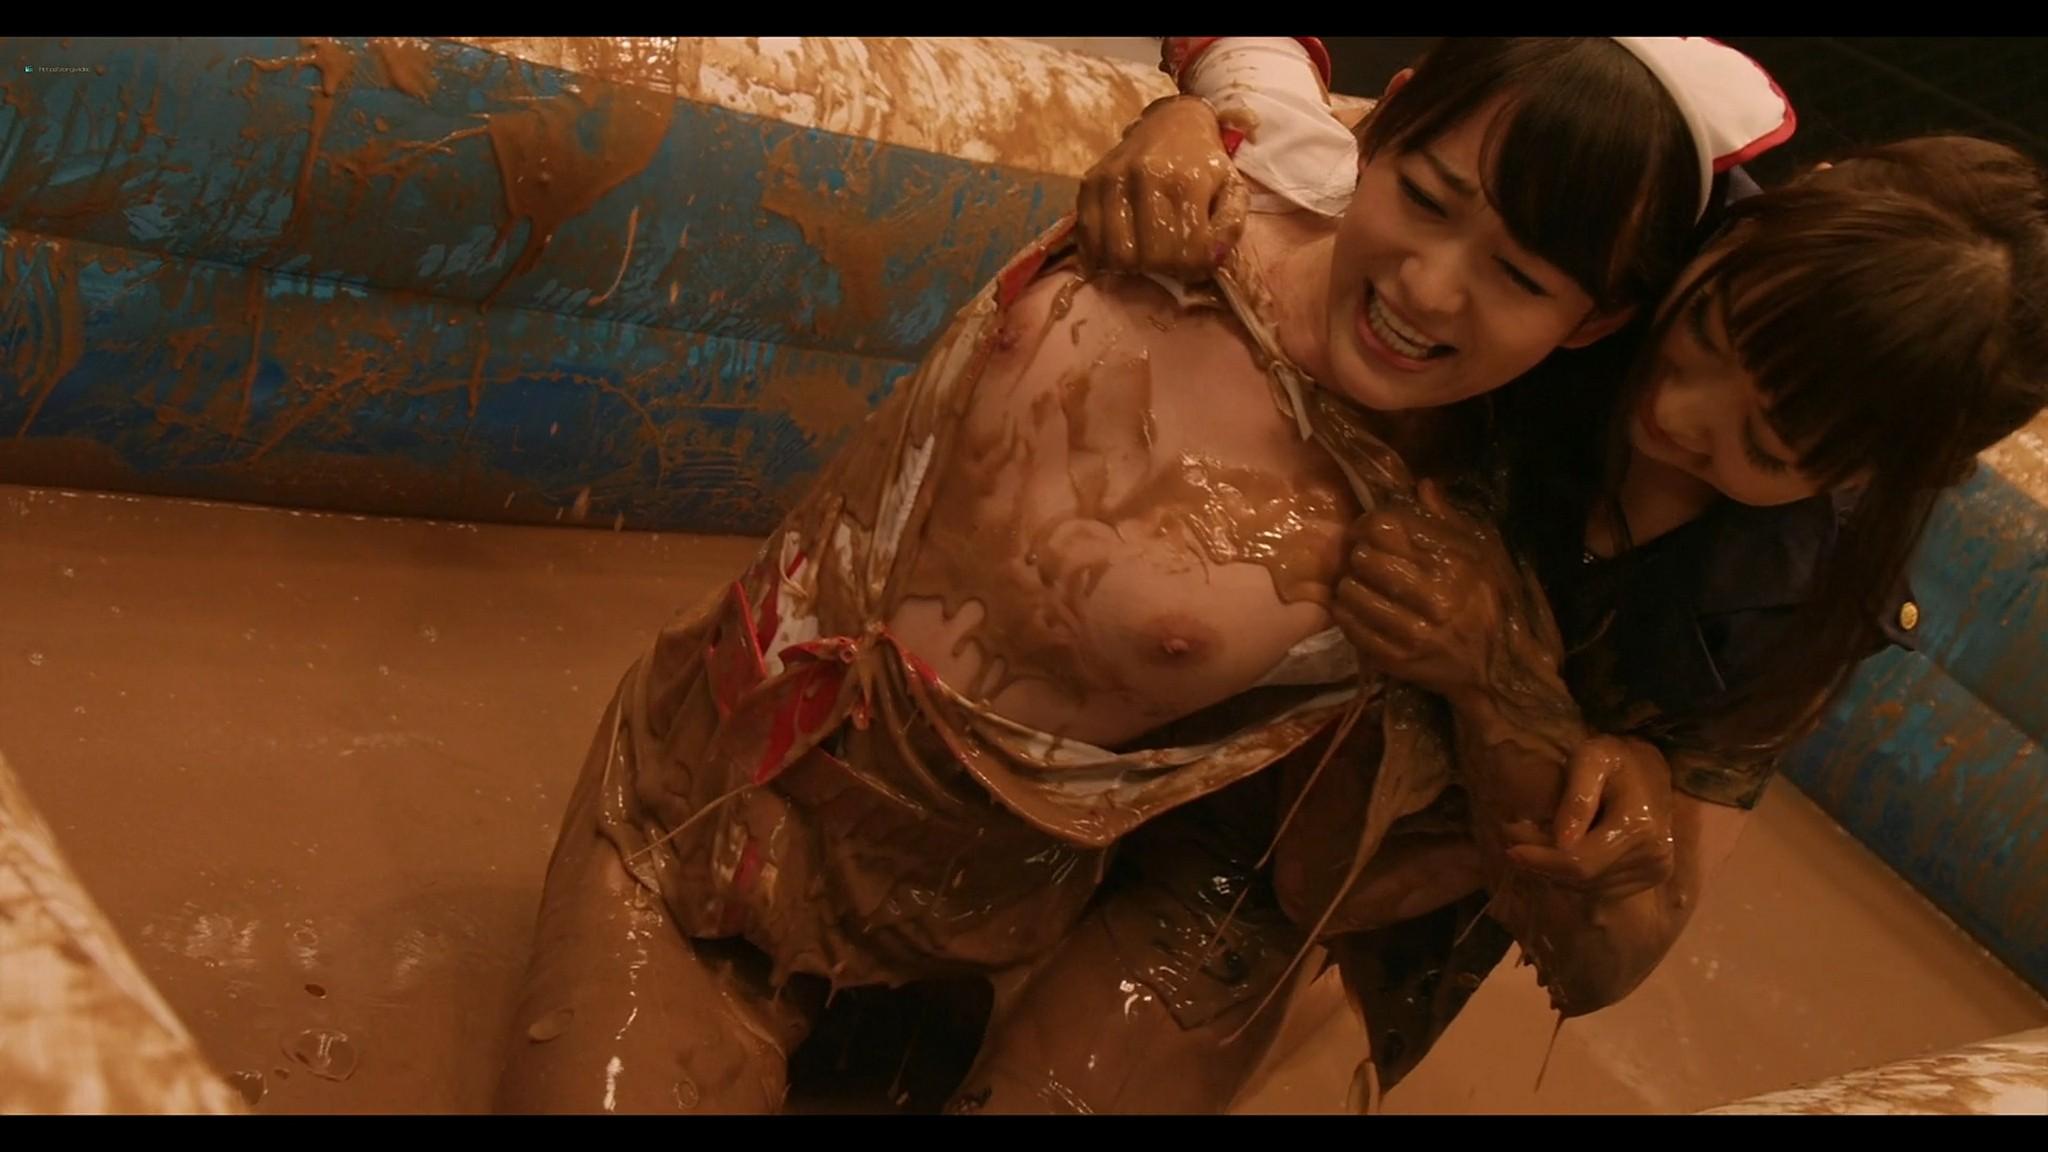 Asami Tada nude full frontal Yuria Haga Haruka Ayase nude too Girls Blood JP 2014 1080p BluRay 4